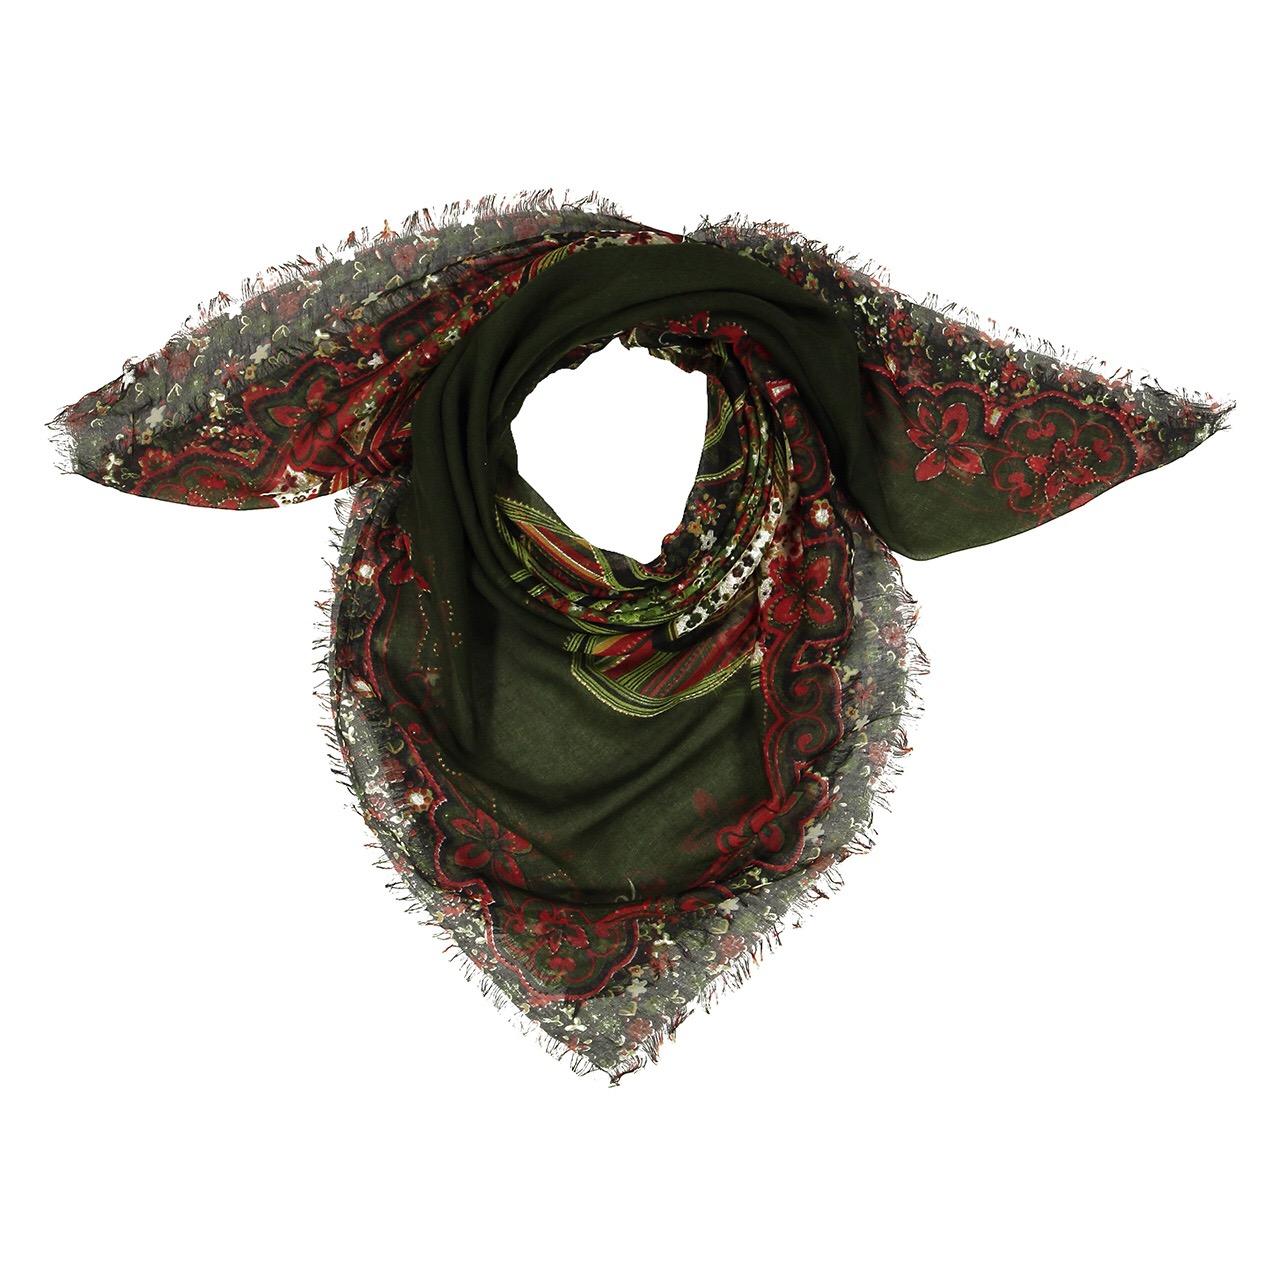 روسری زنانه کد 144